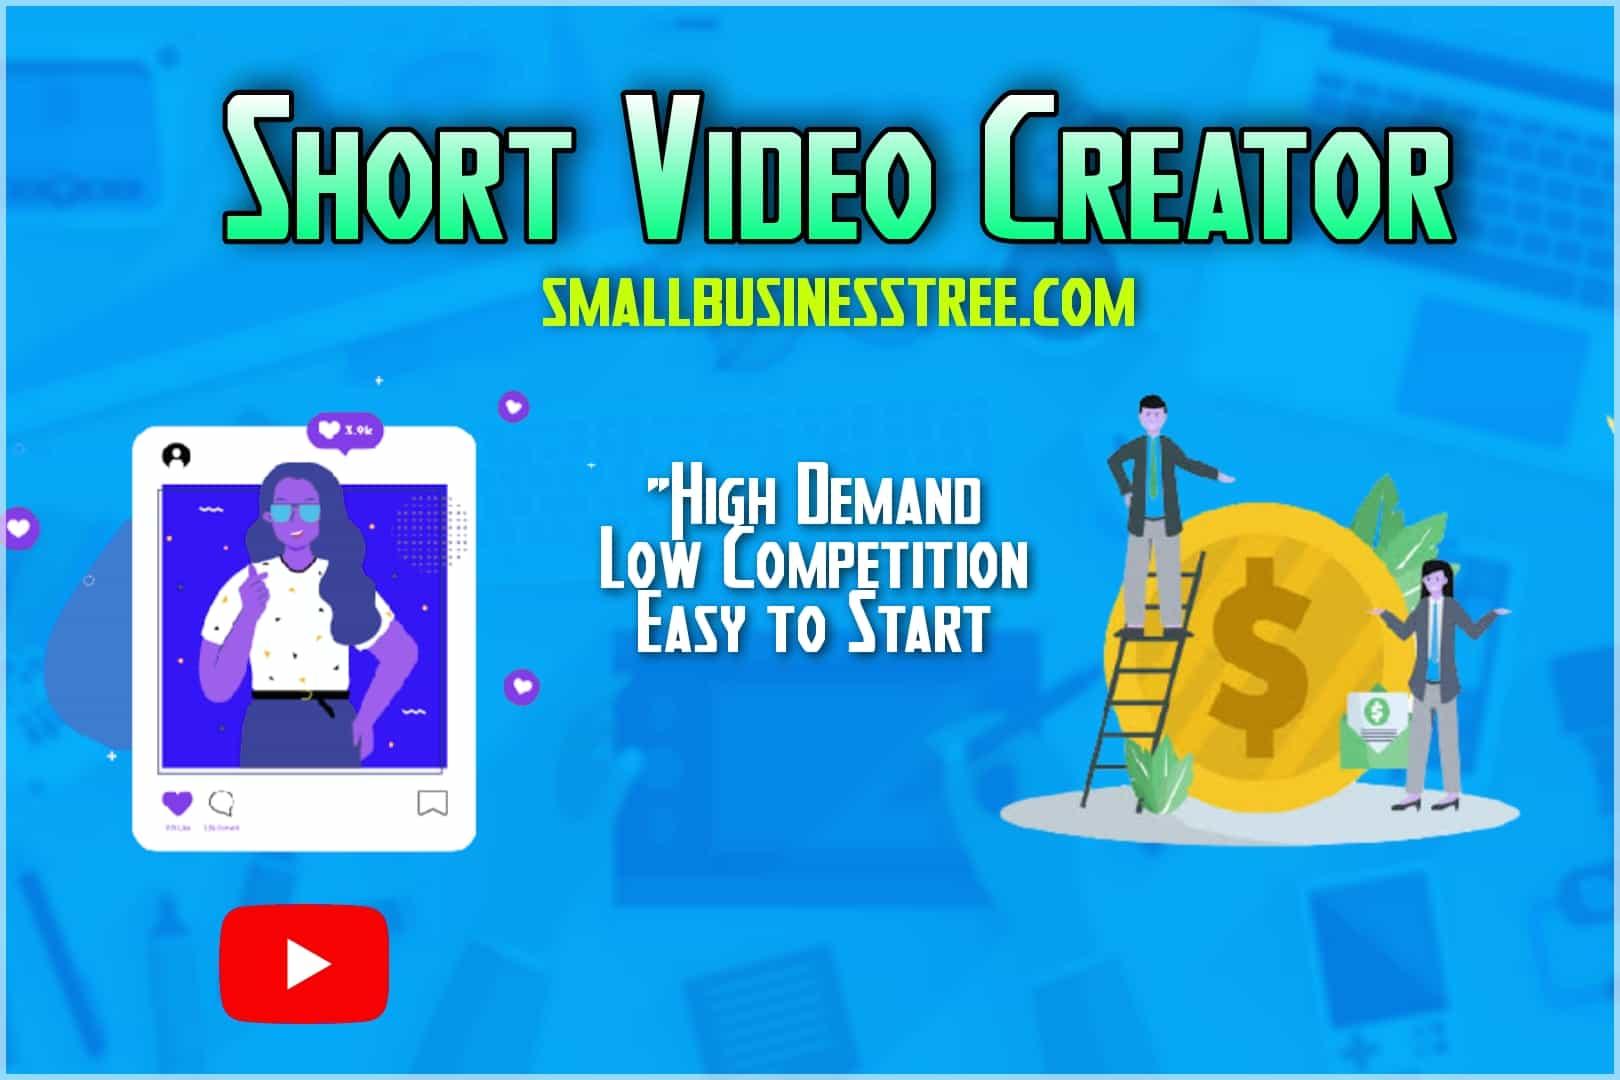 Short Video Creator